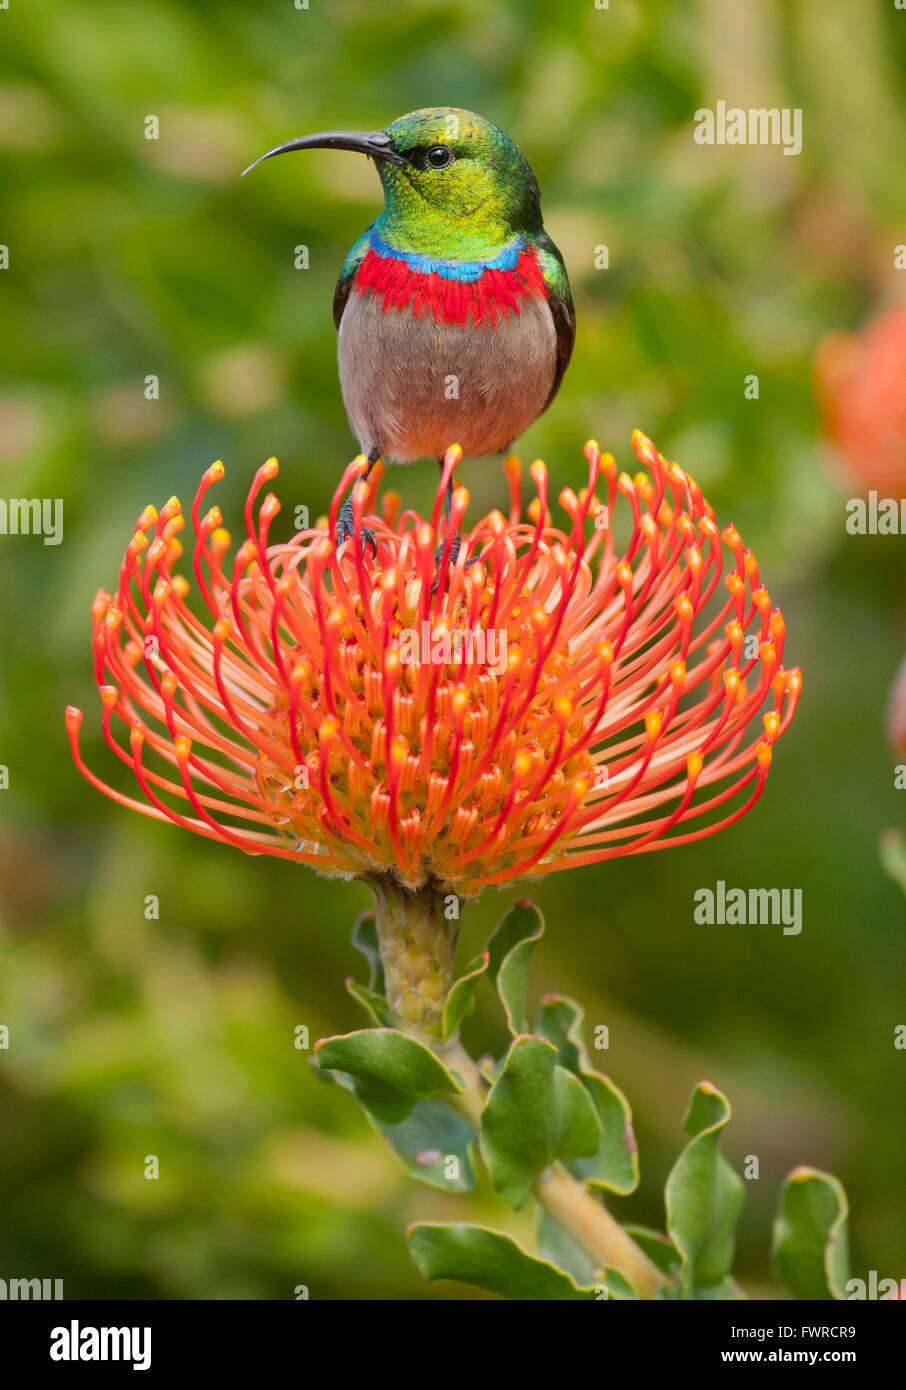 Southern Double-collared Sunbird (Cinnyris chalybeus) on 'Pincushion' Protea  Kirstenbosch Gardens, Cape - Stock Image